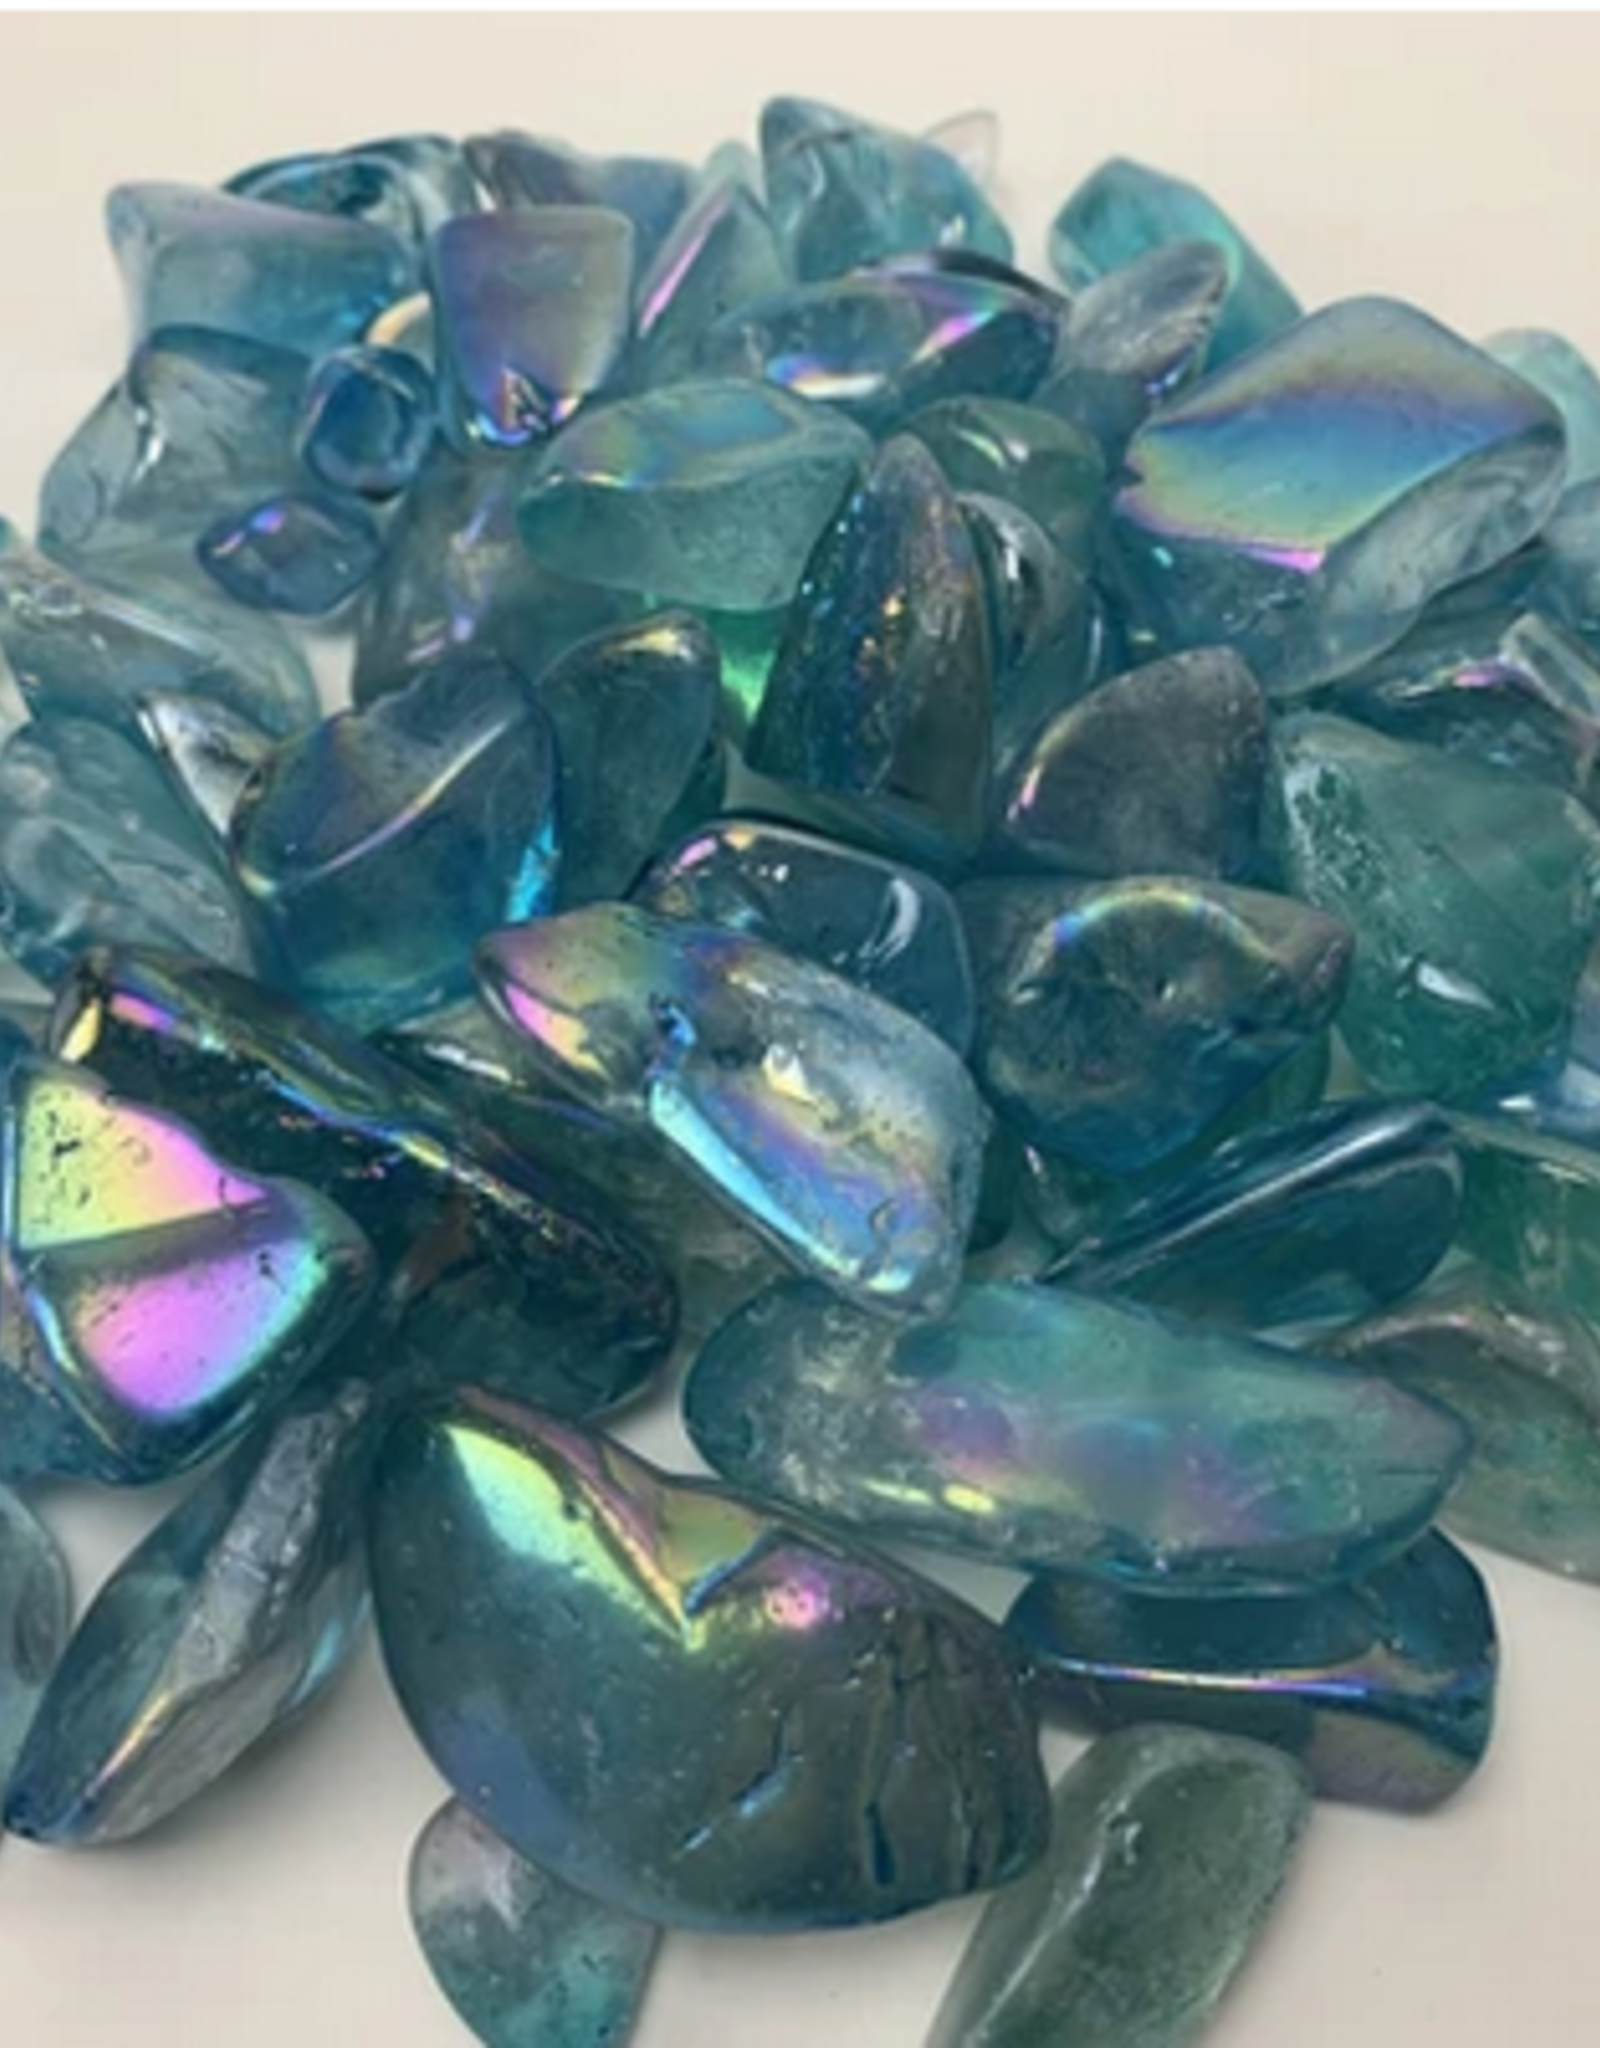 Pelham Grayson Blue Aura Quartz tumbled